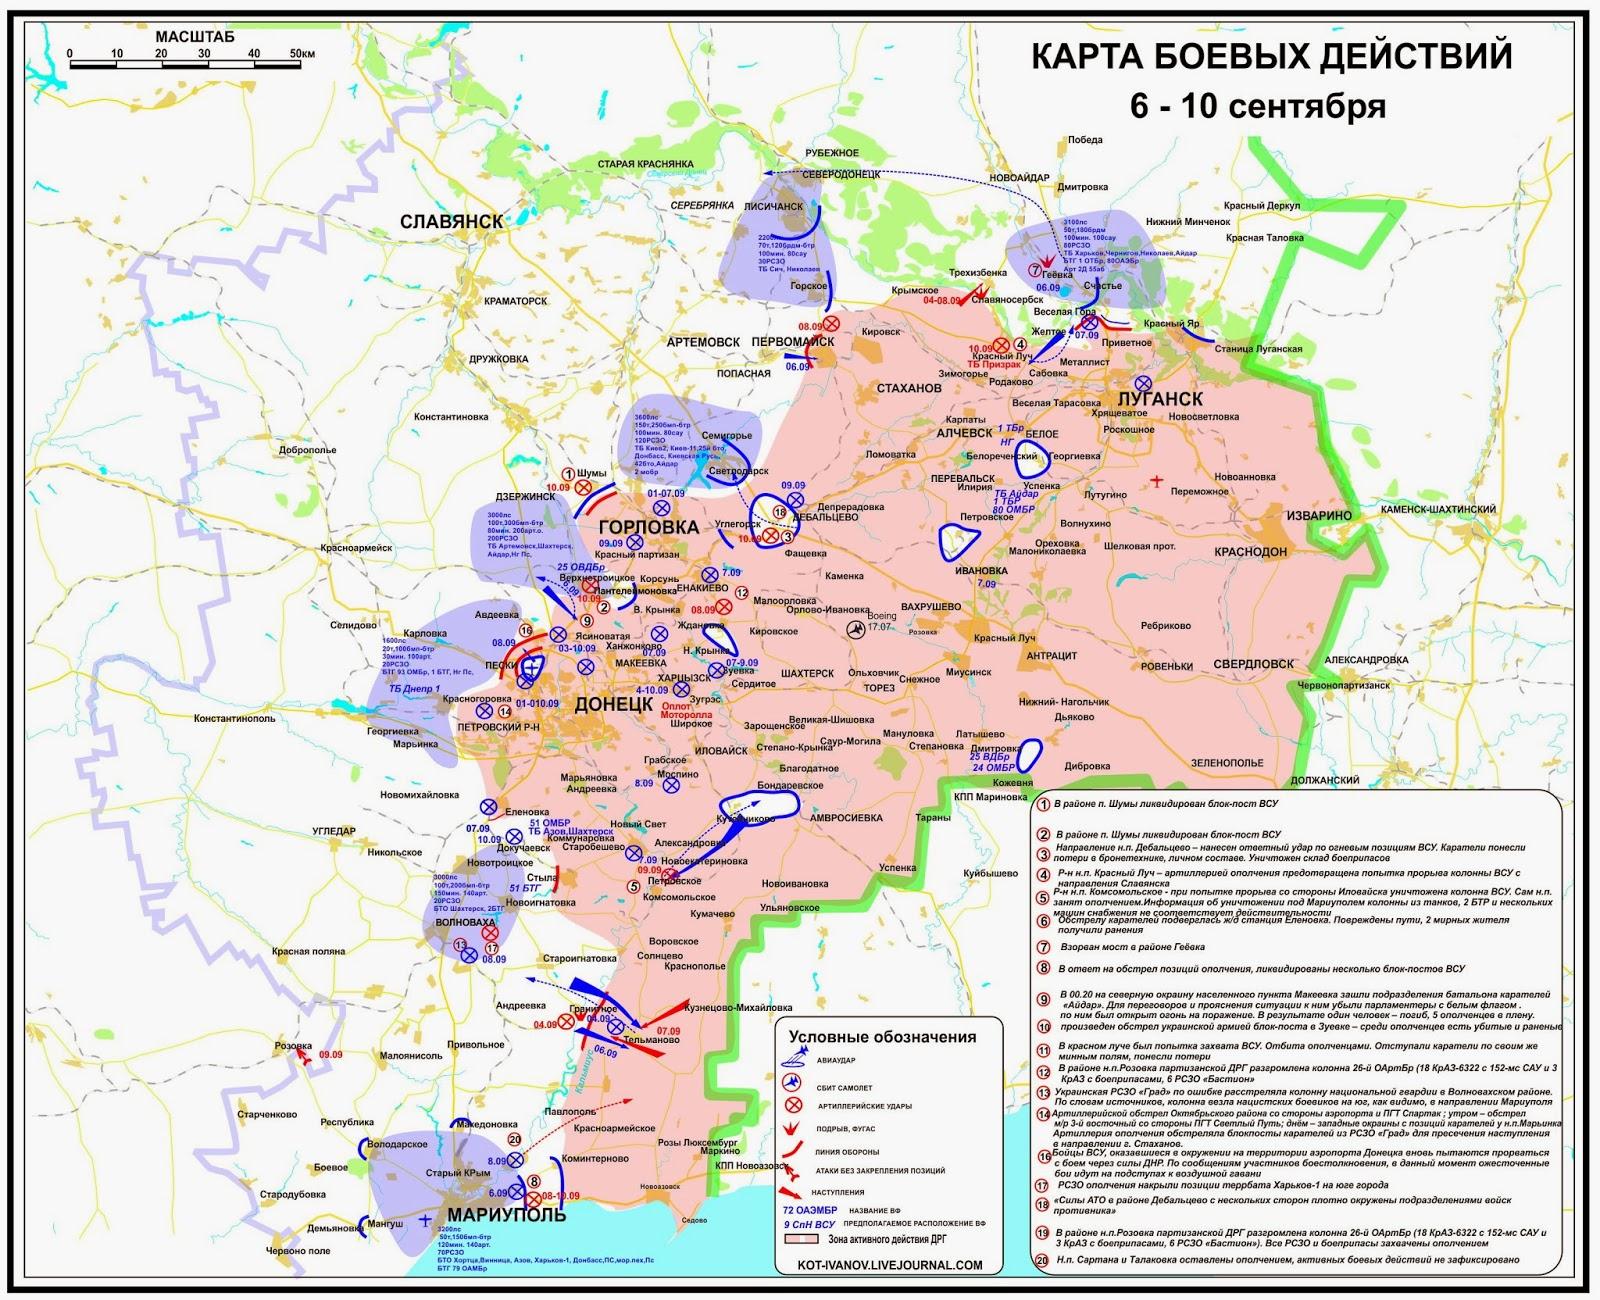 aircrafts shot down over donbass region of ukraine donetsk and luhansk provinces